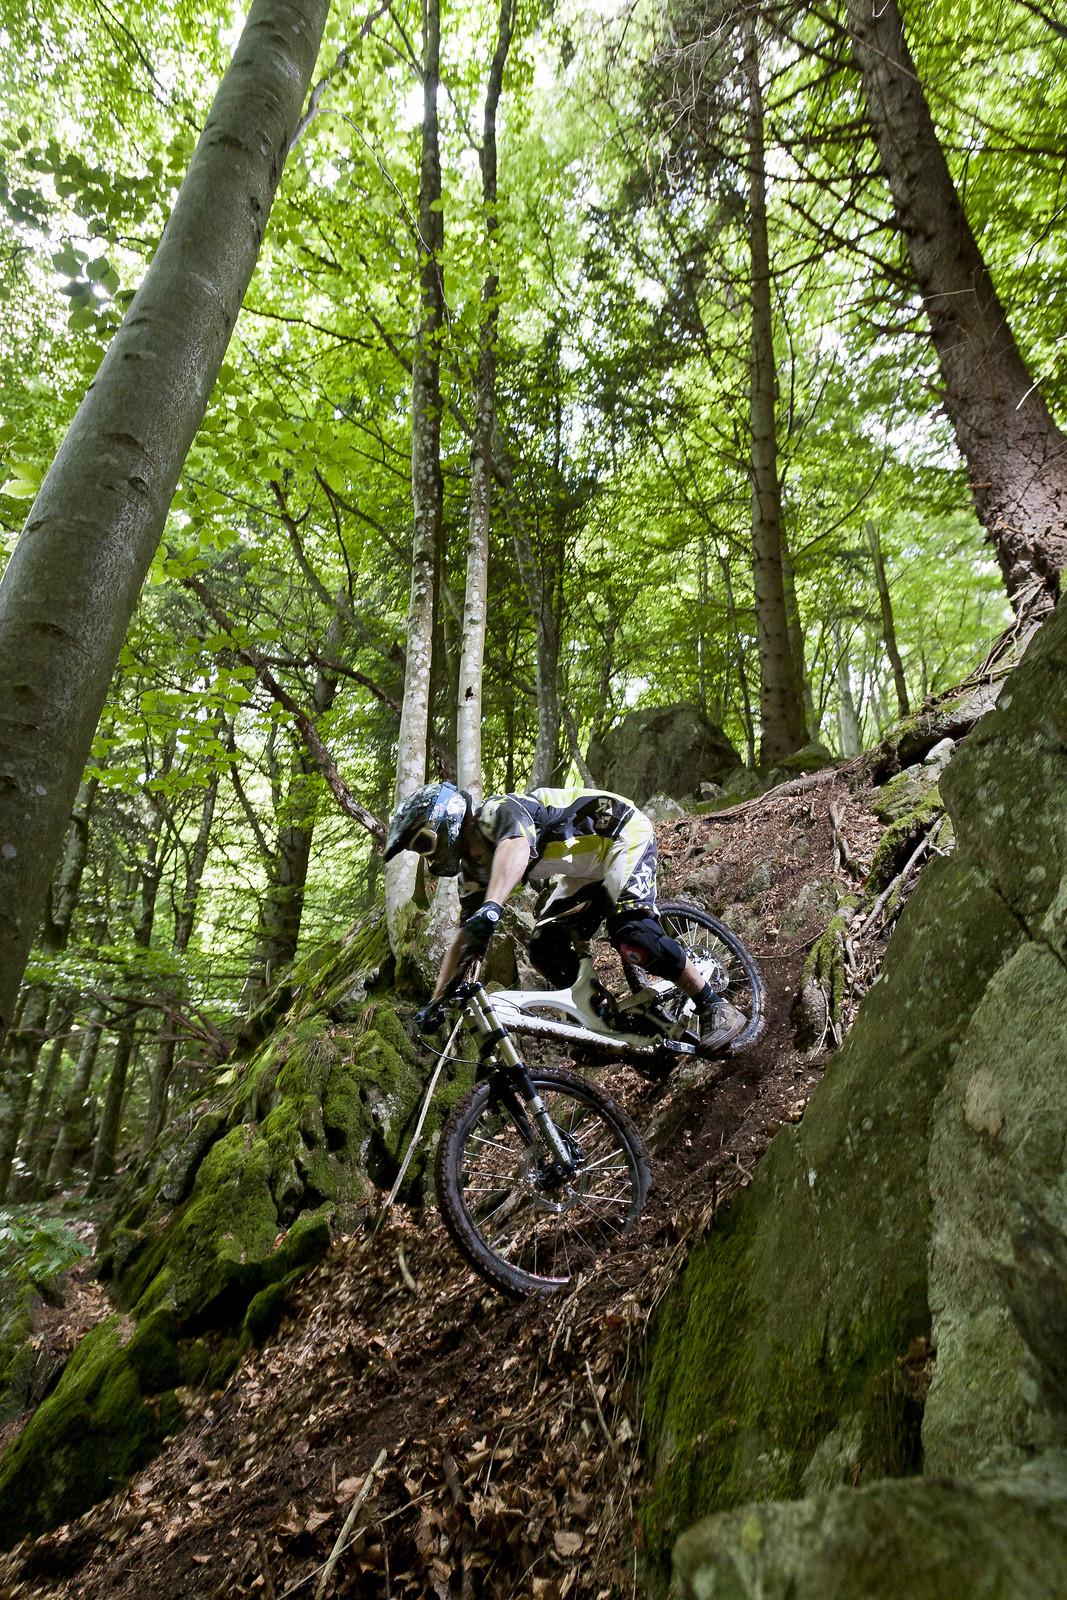 Secret Spot in the Black Forest - quasibinaer - Mountain Biking Pictures - Vital MTB